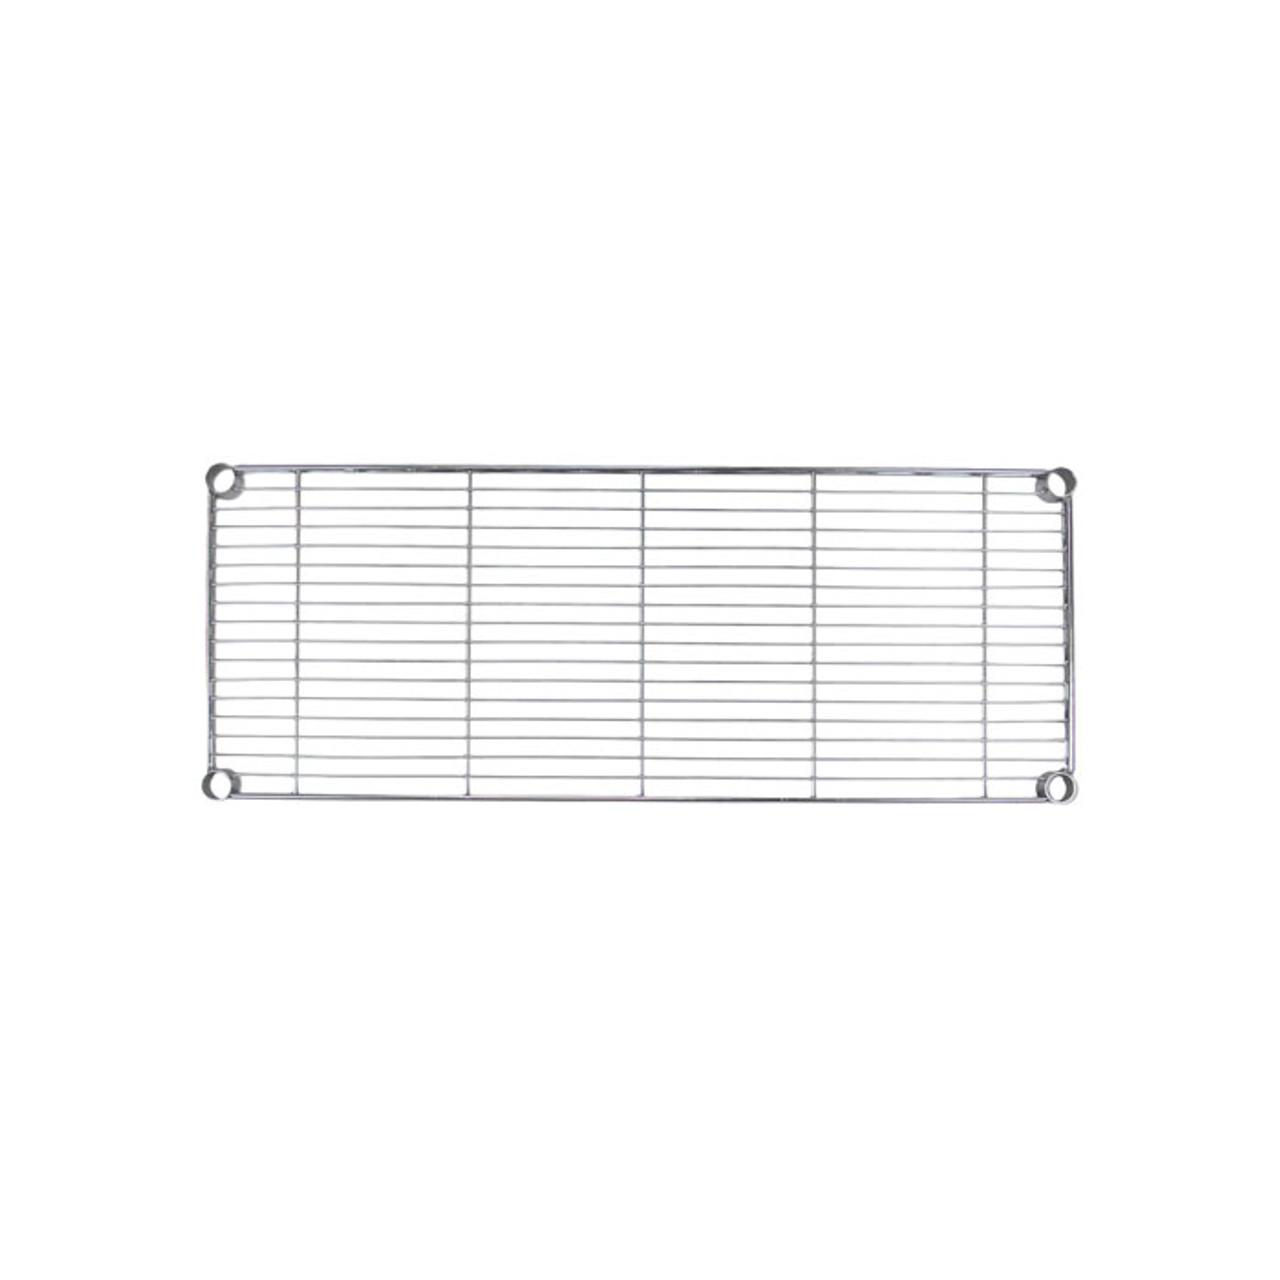 Wire Shelfs | Chrome Standard Wire Shelving System Shelves Solutions Your